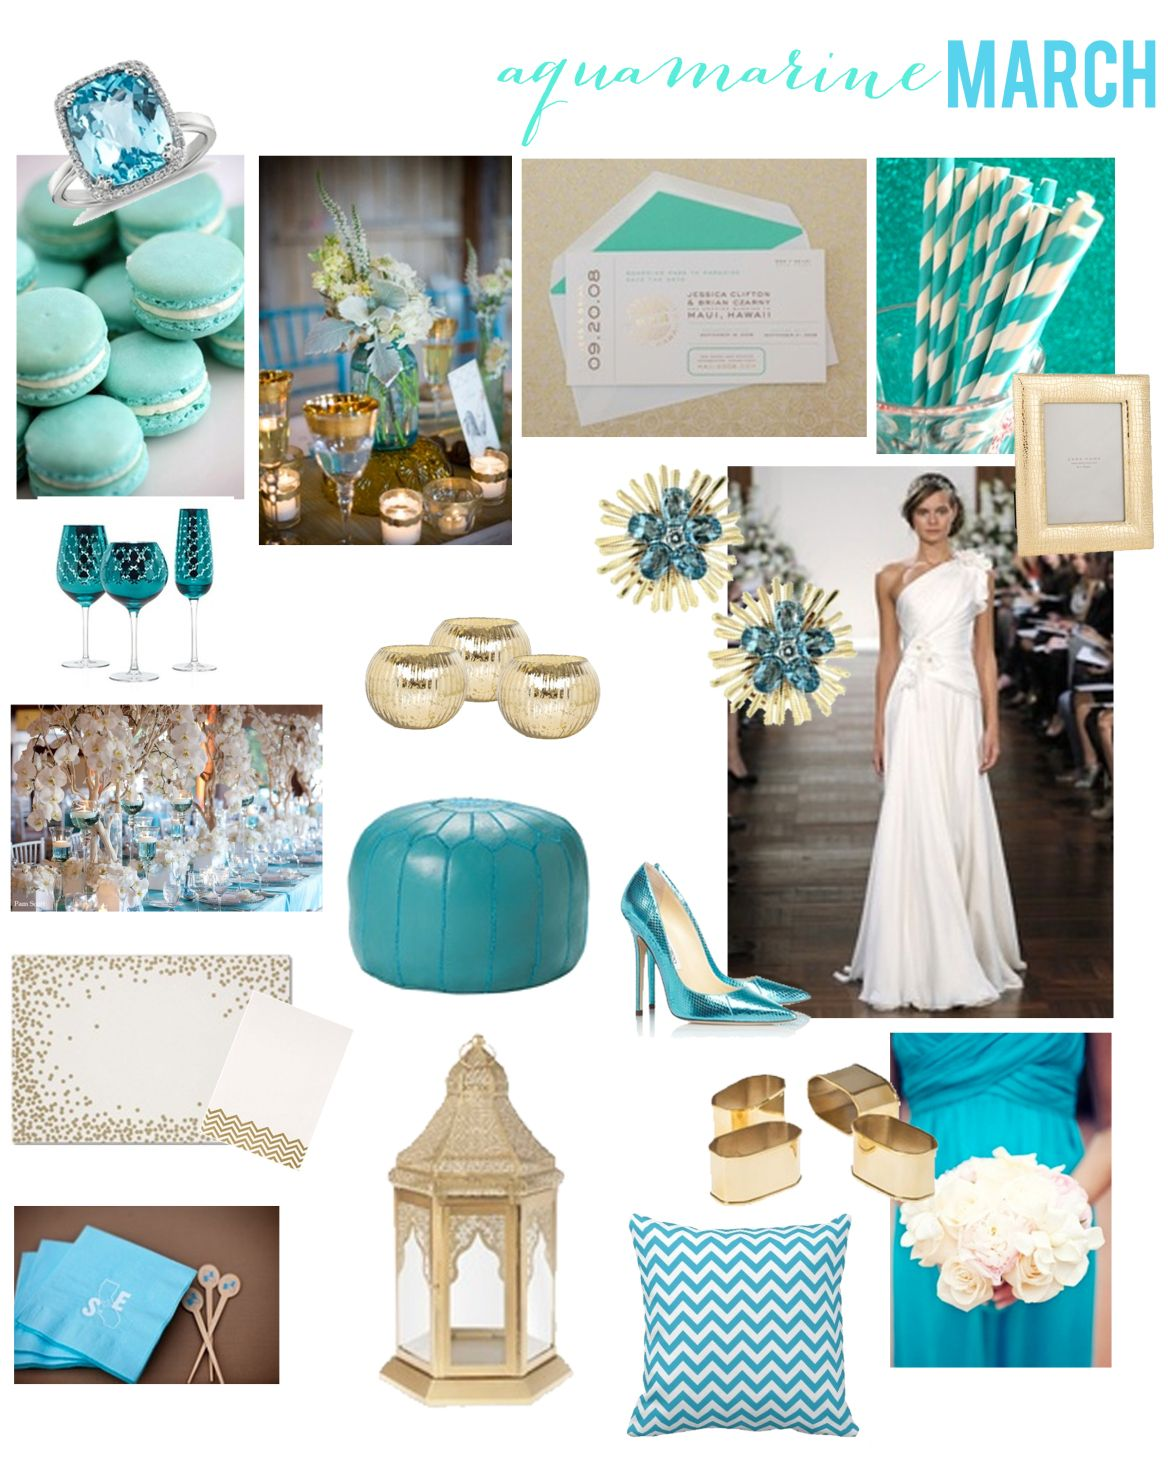 march birthstone inspiration aquamarine aquamarines and march